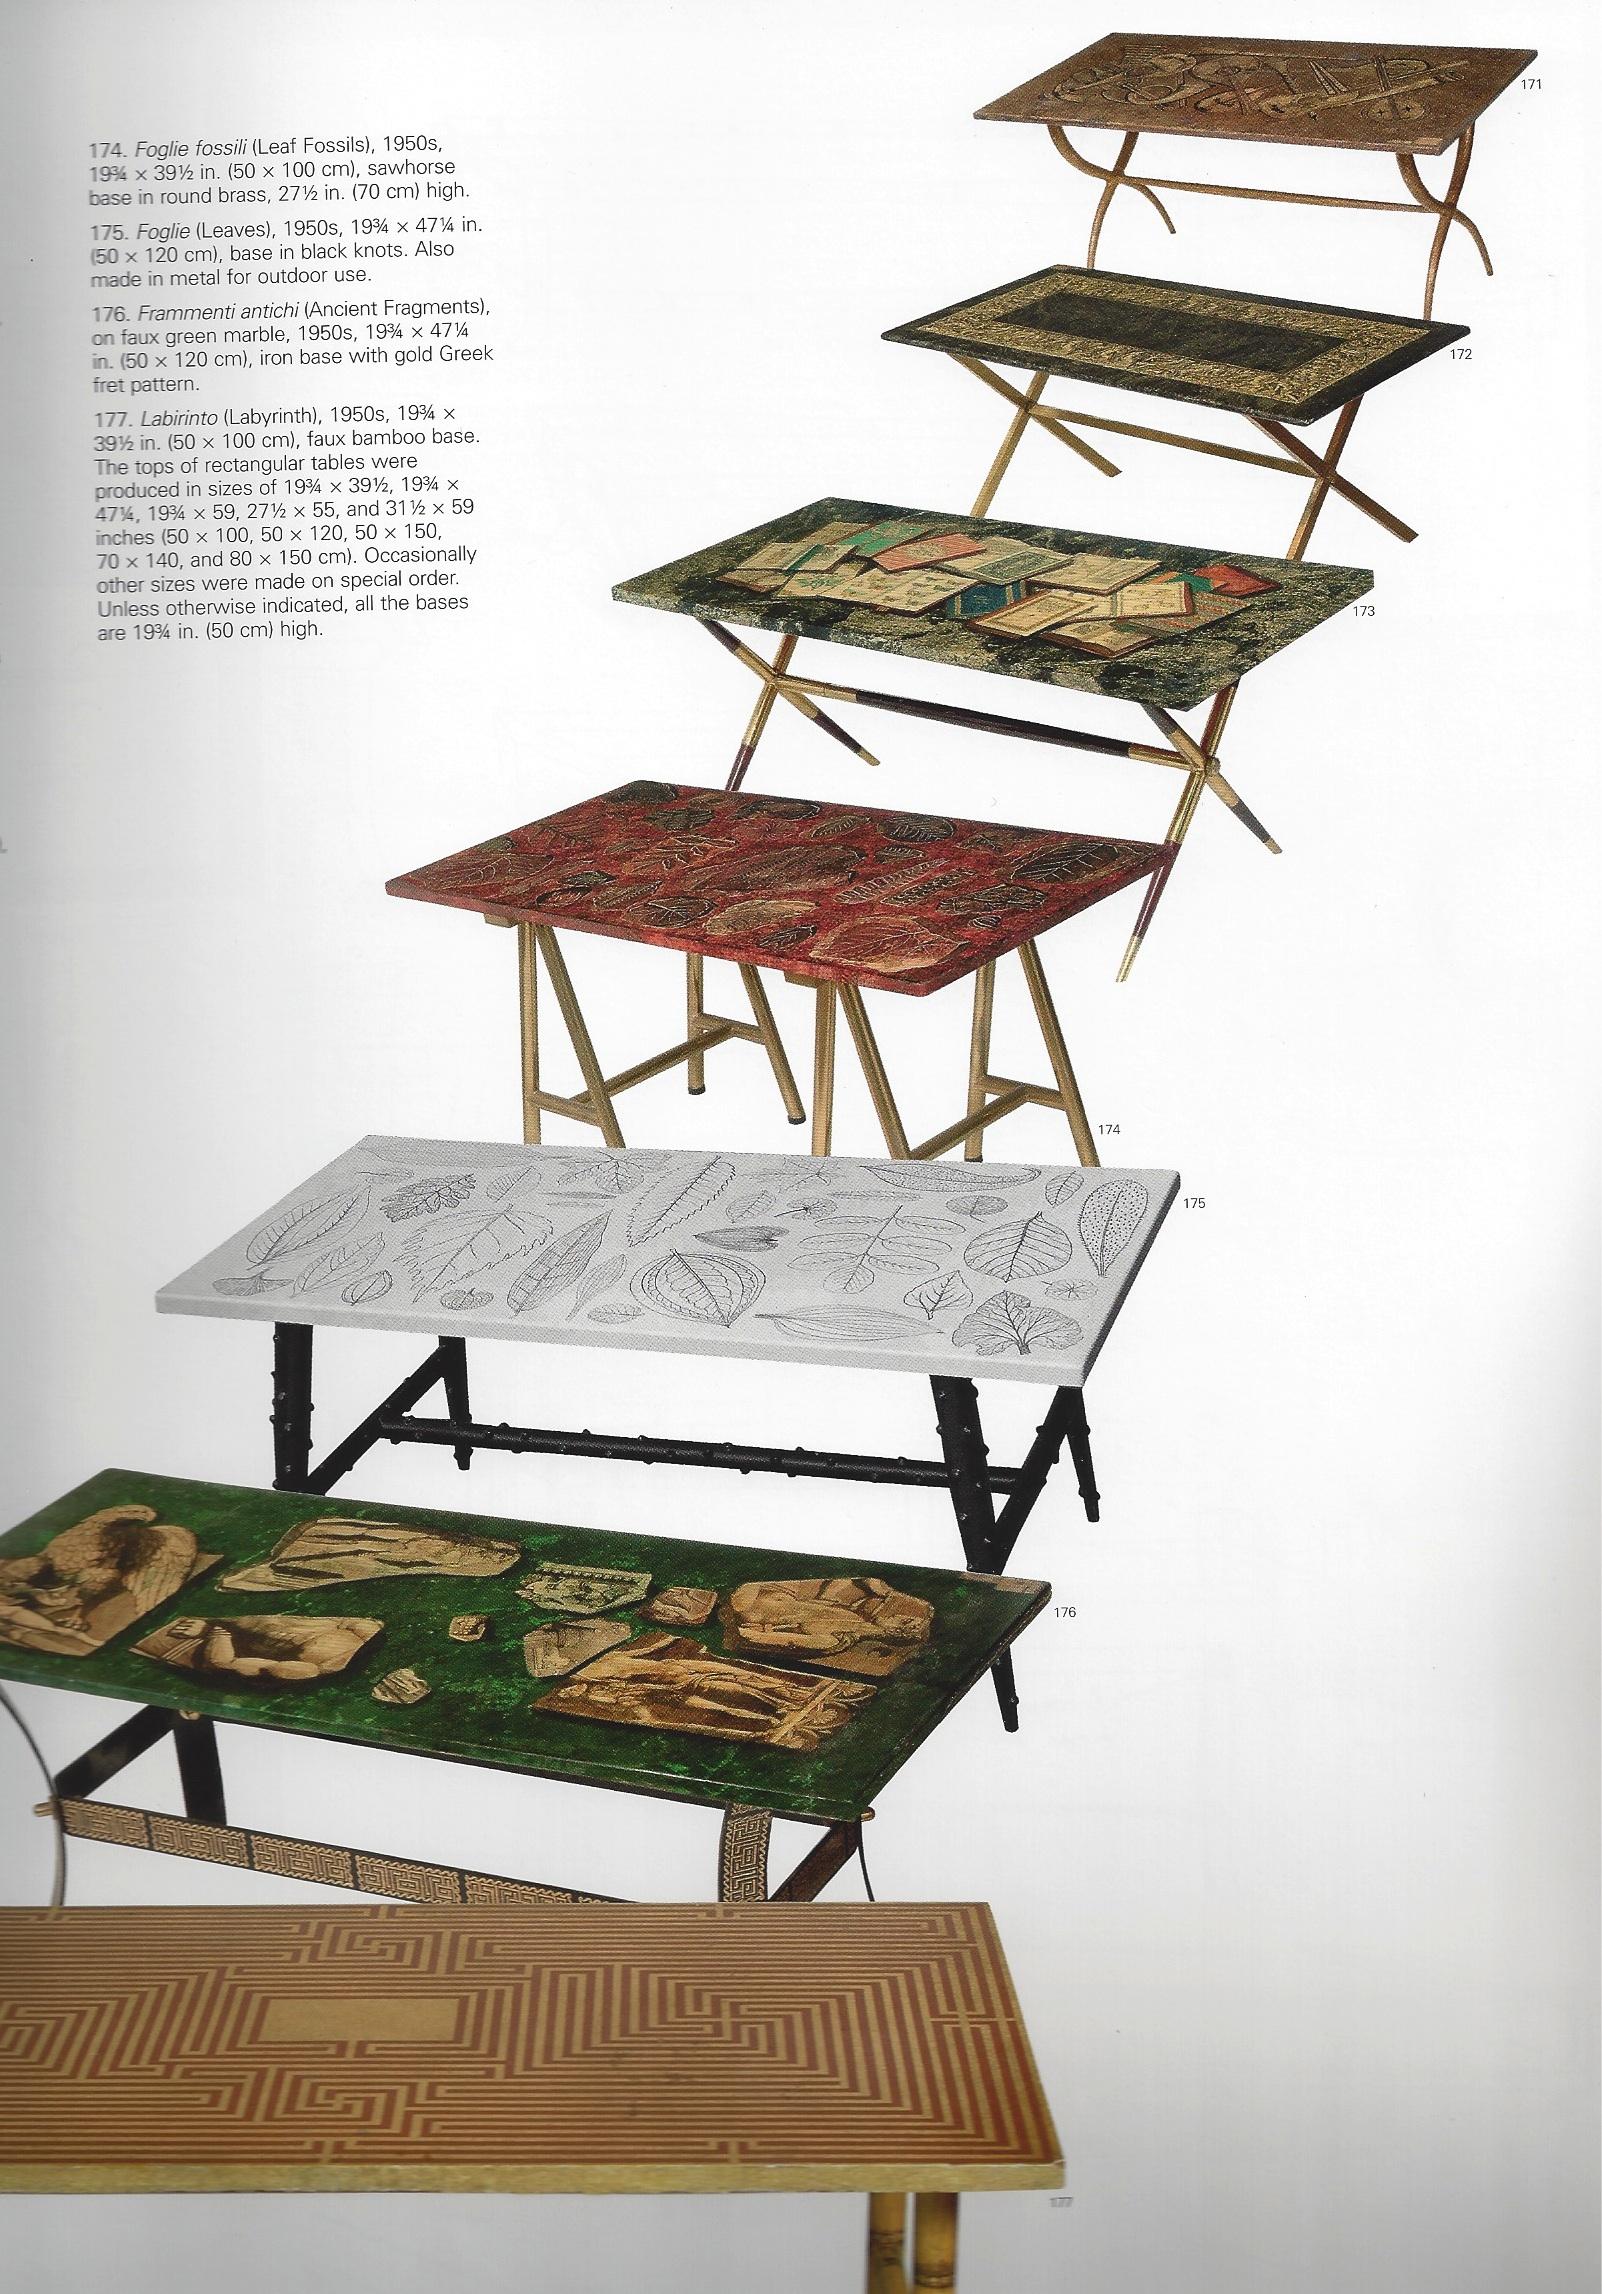 ... Fornasetti Coffee Table ...